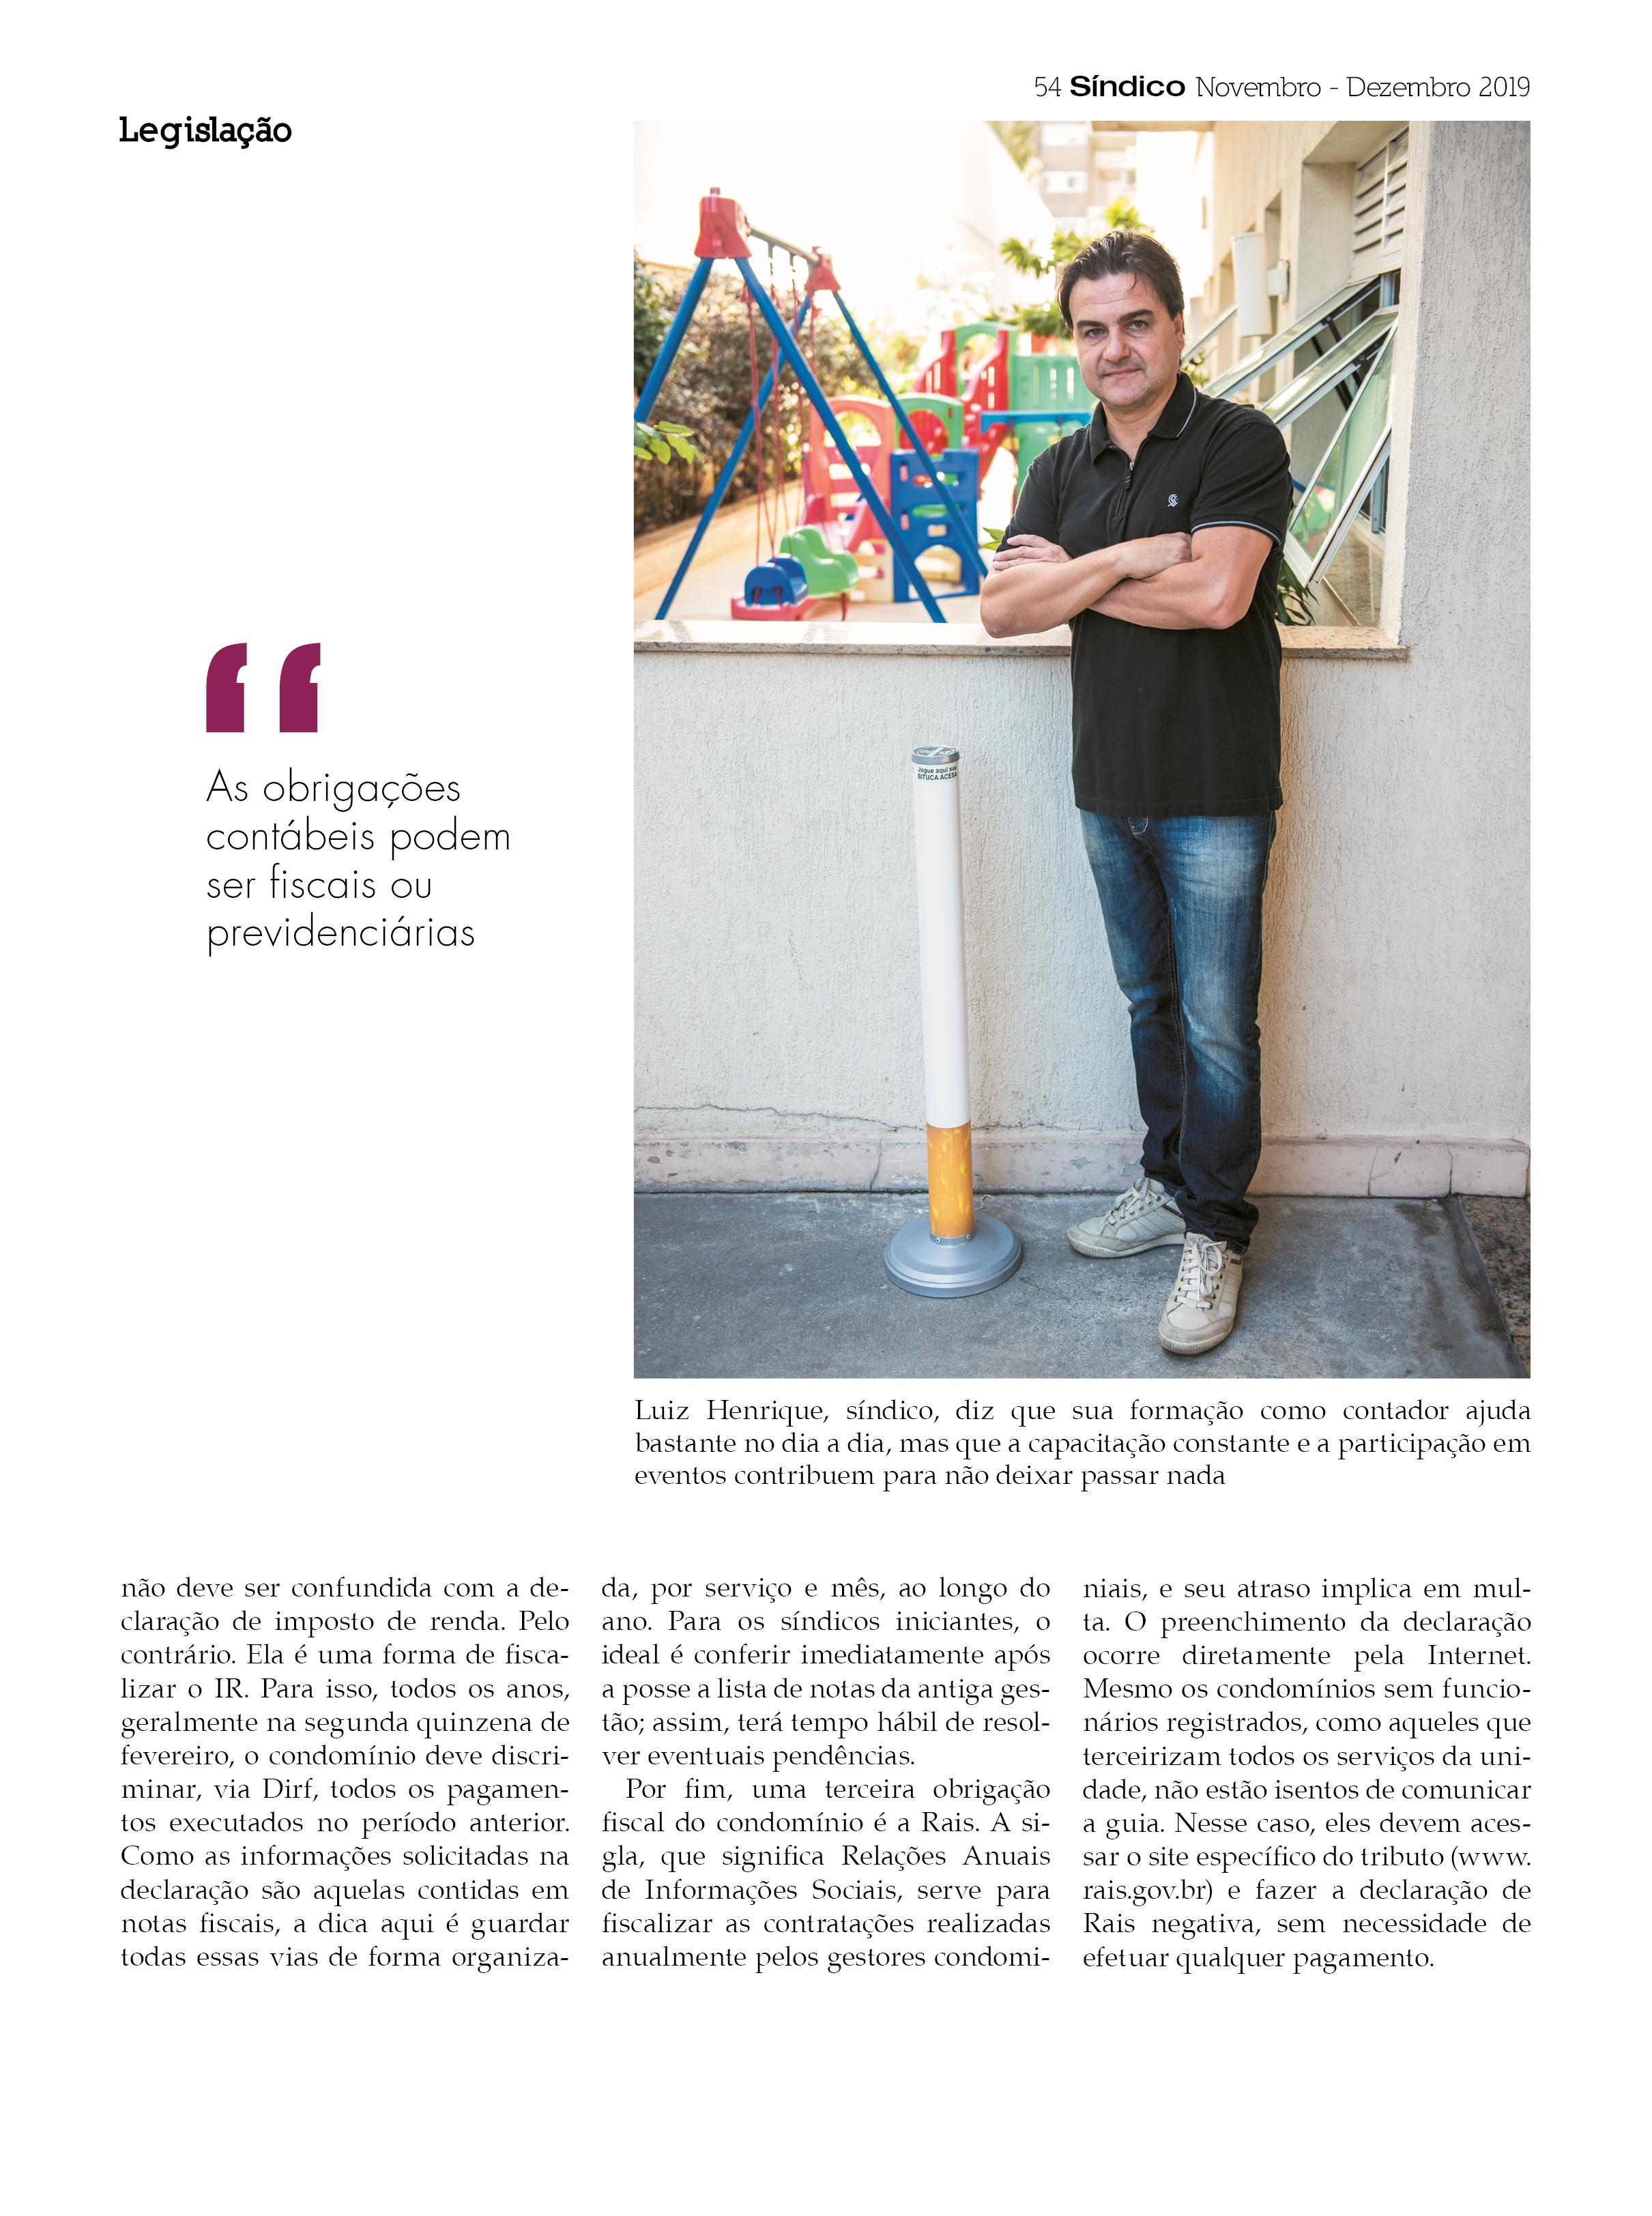 Revista Síndico_ed 247_52